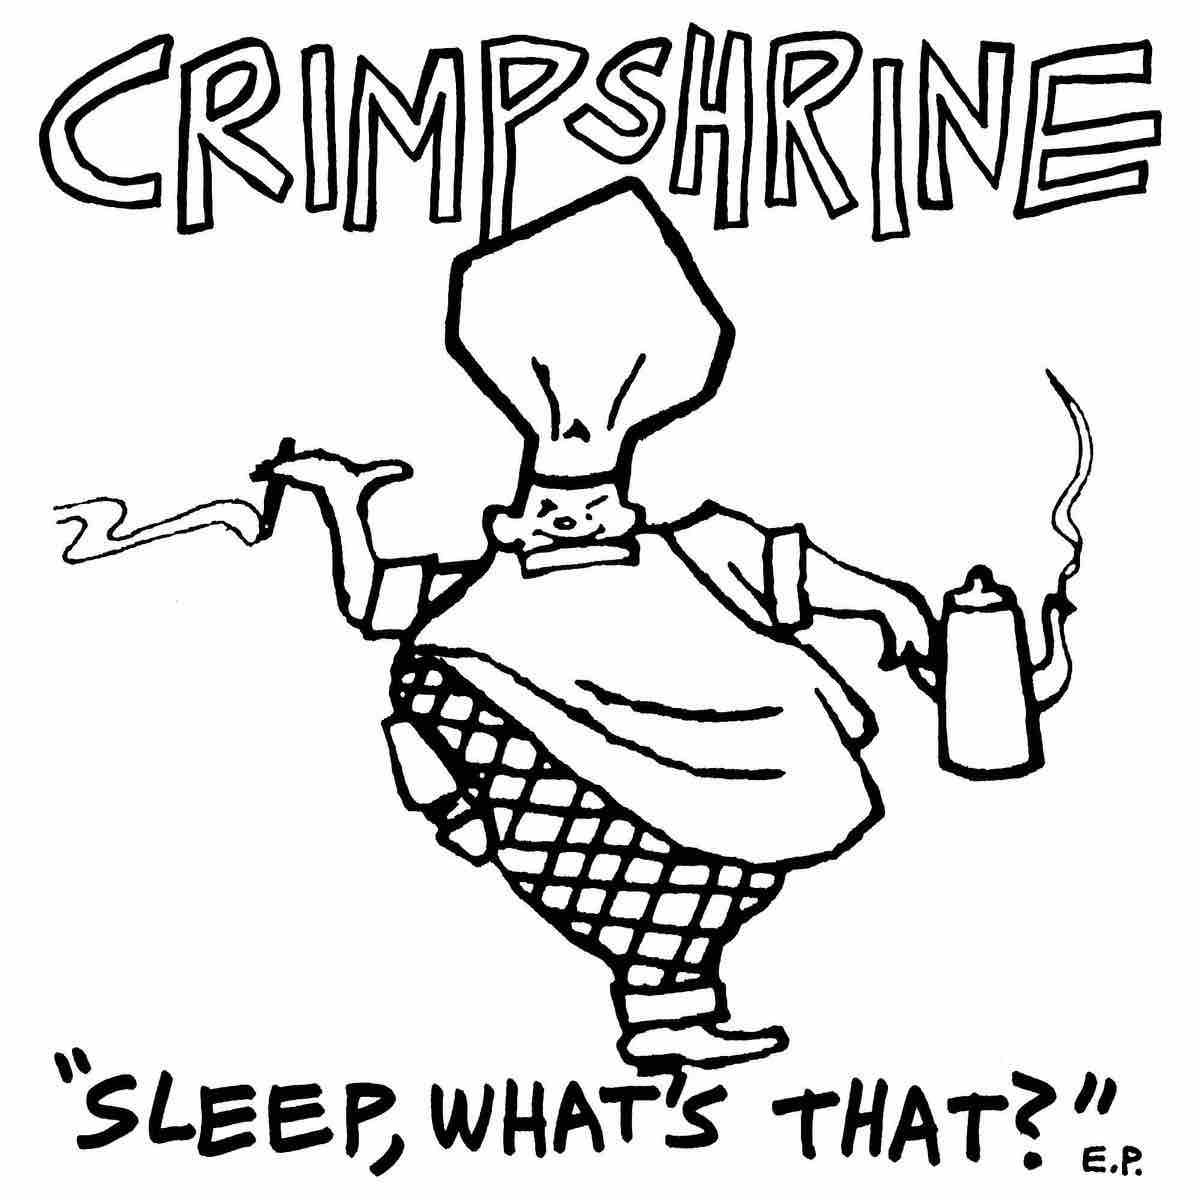 crimpshrine ep